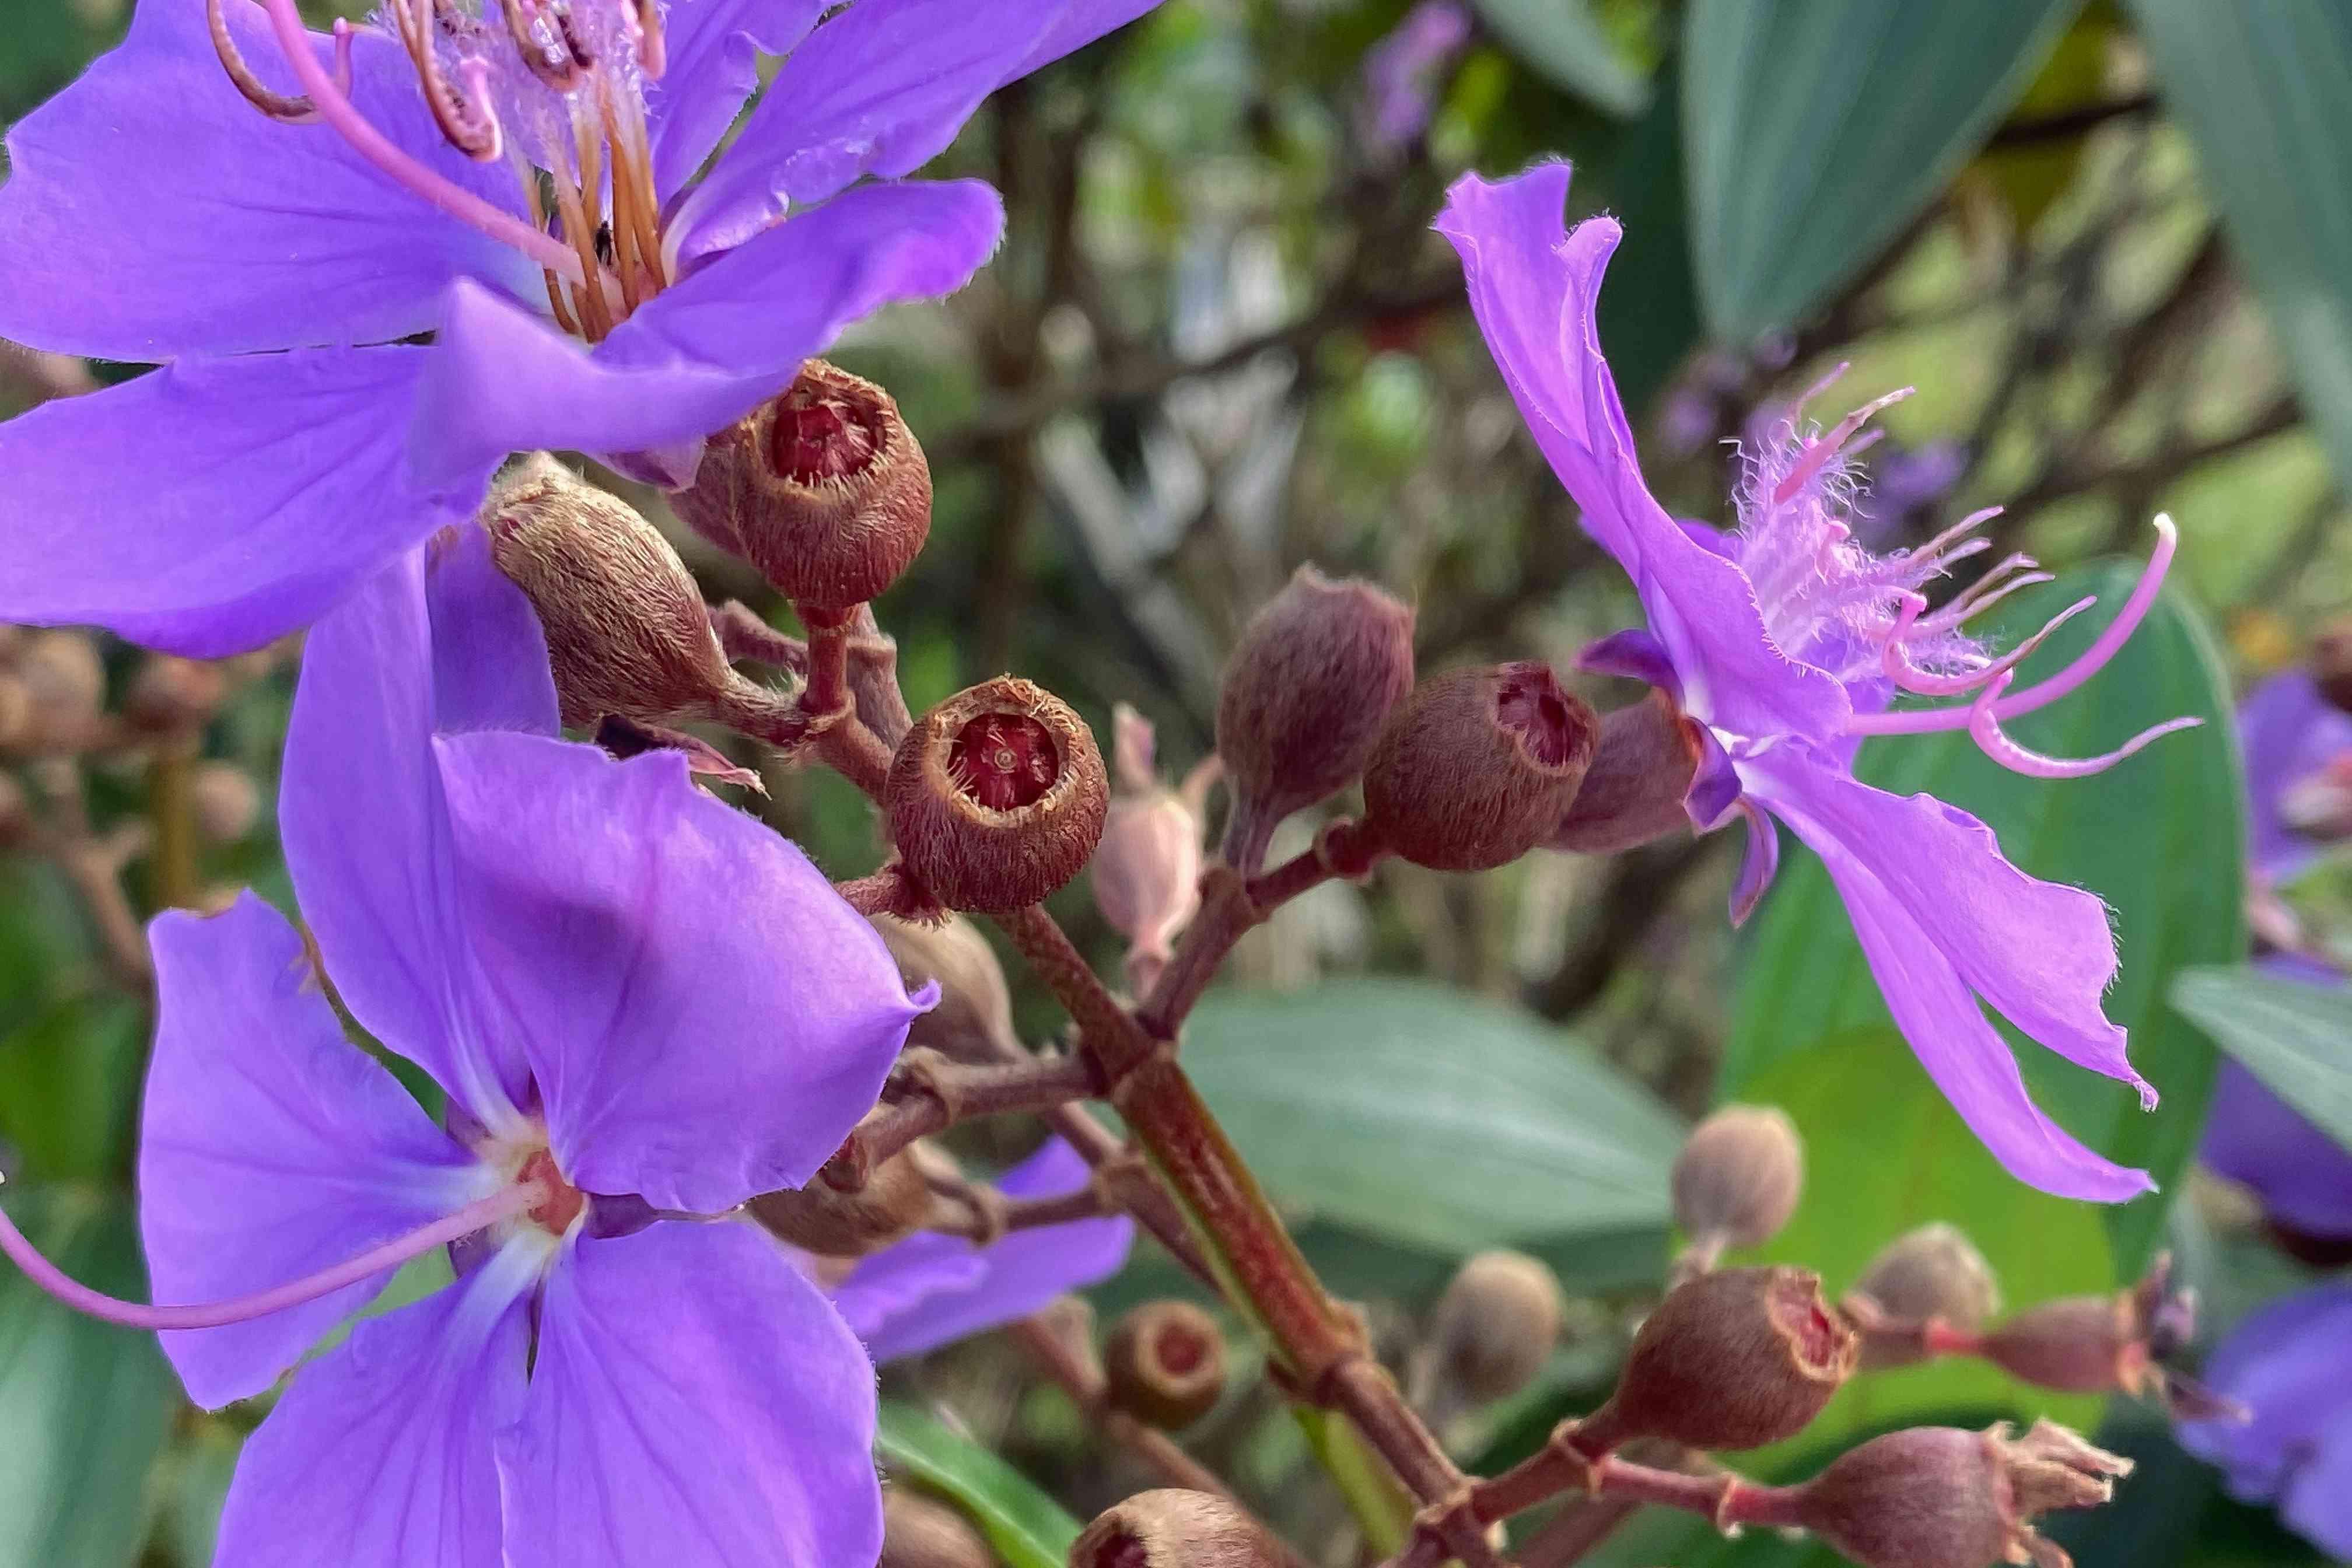 close up of a purple princess